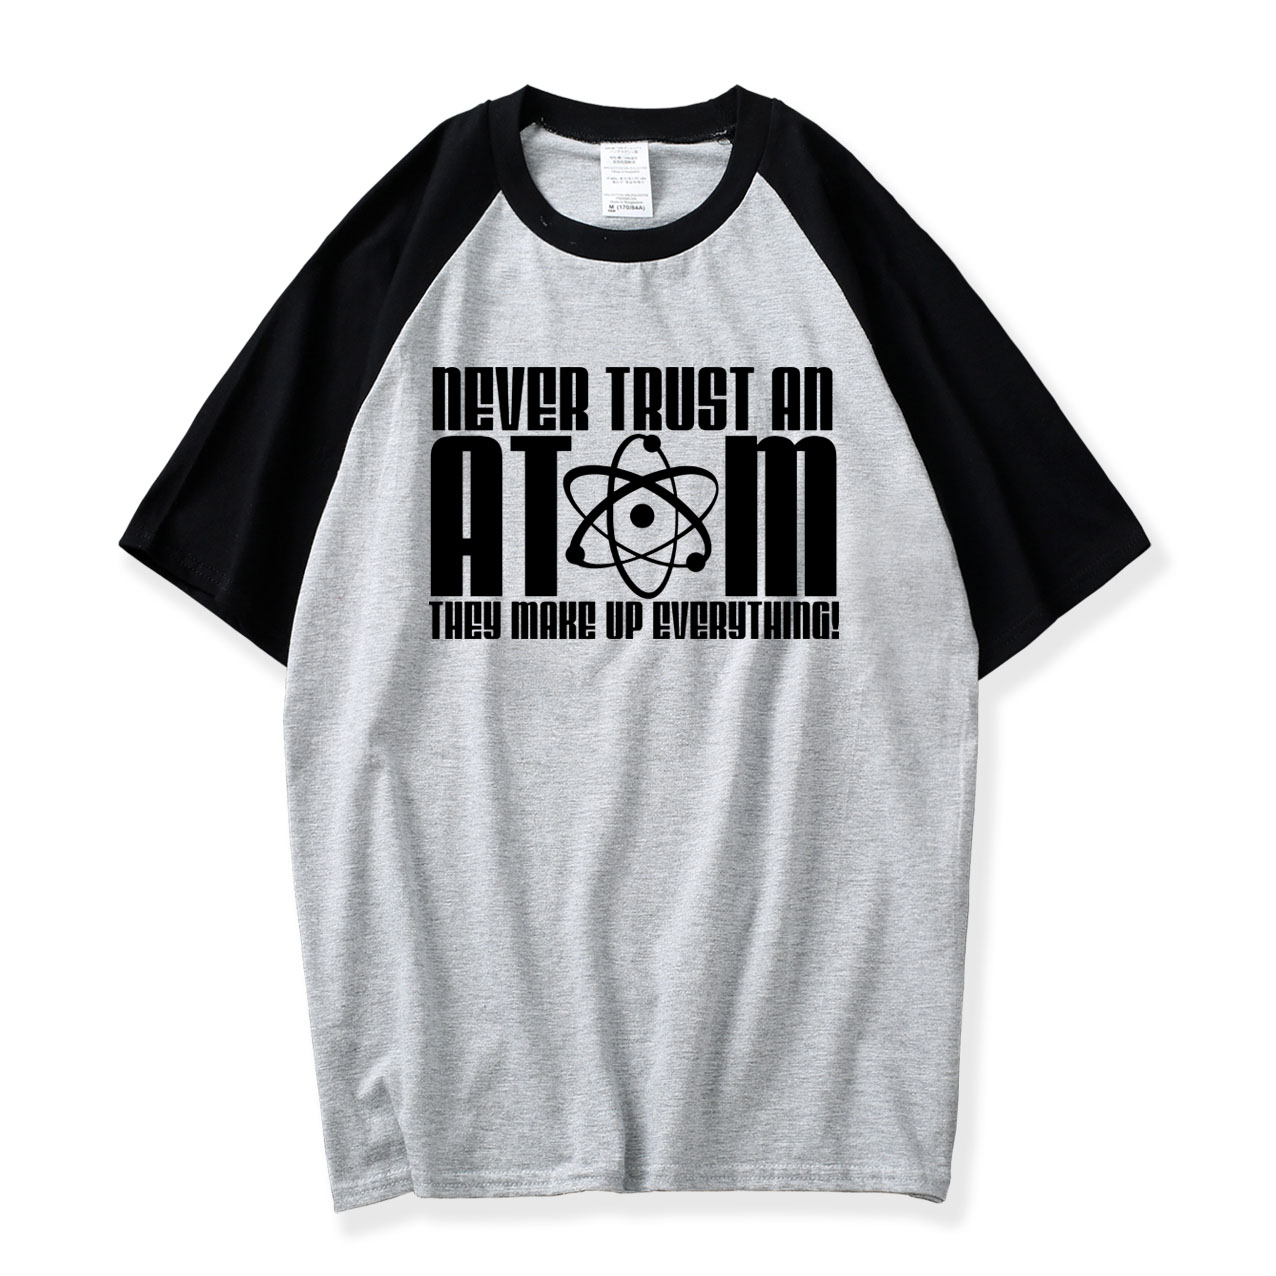 Raglan Short Sleeve T Shirt Never Trust an Atom They Make Up Everything Mens Funny T-Shirt 2018 Summer Men Cotton O Neck Shirts